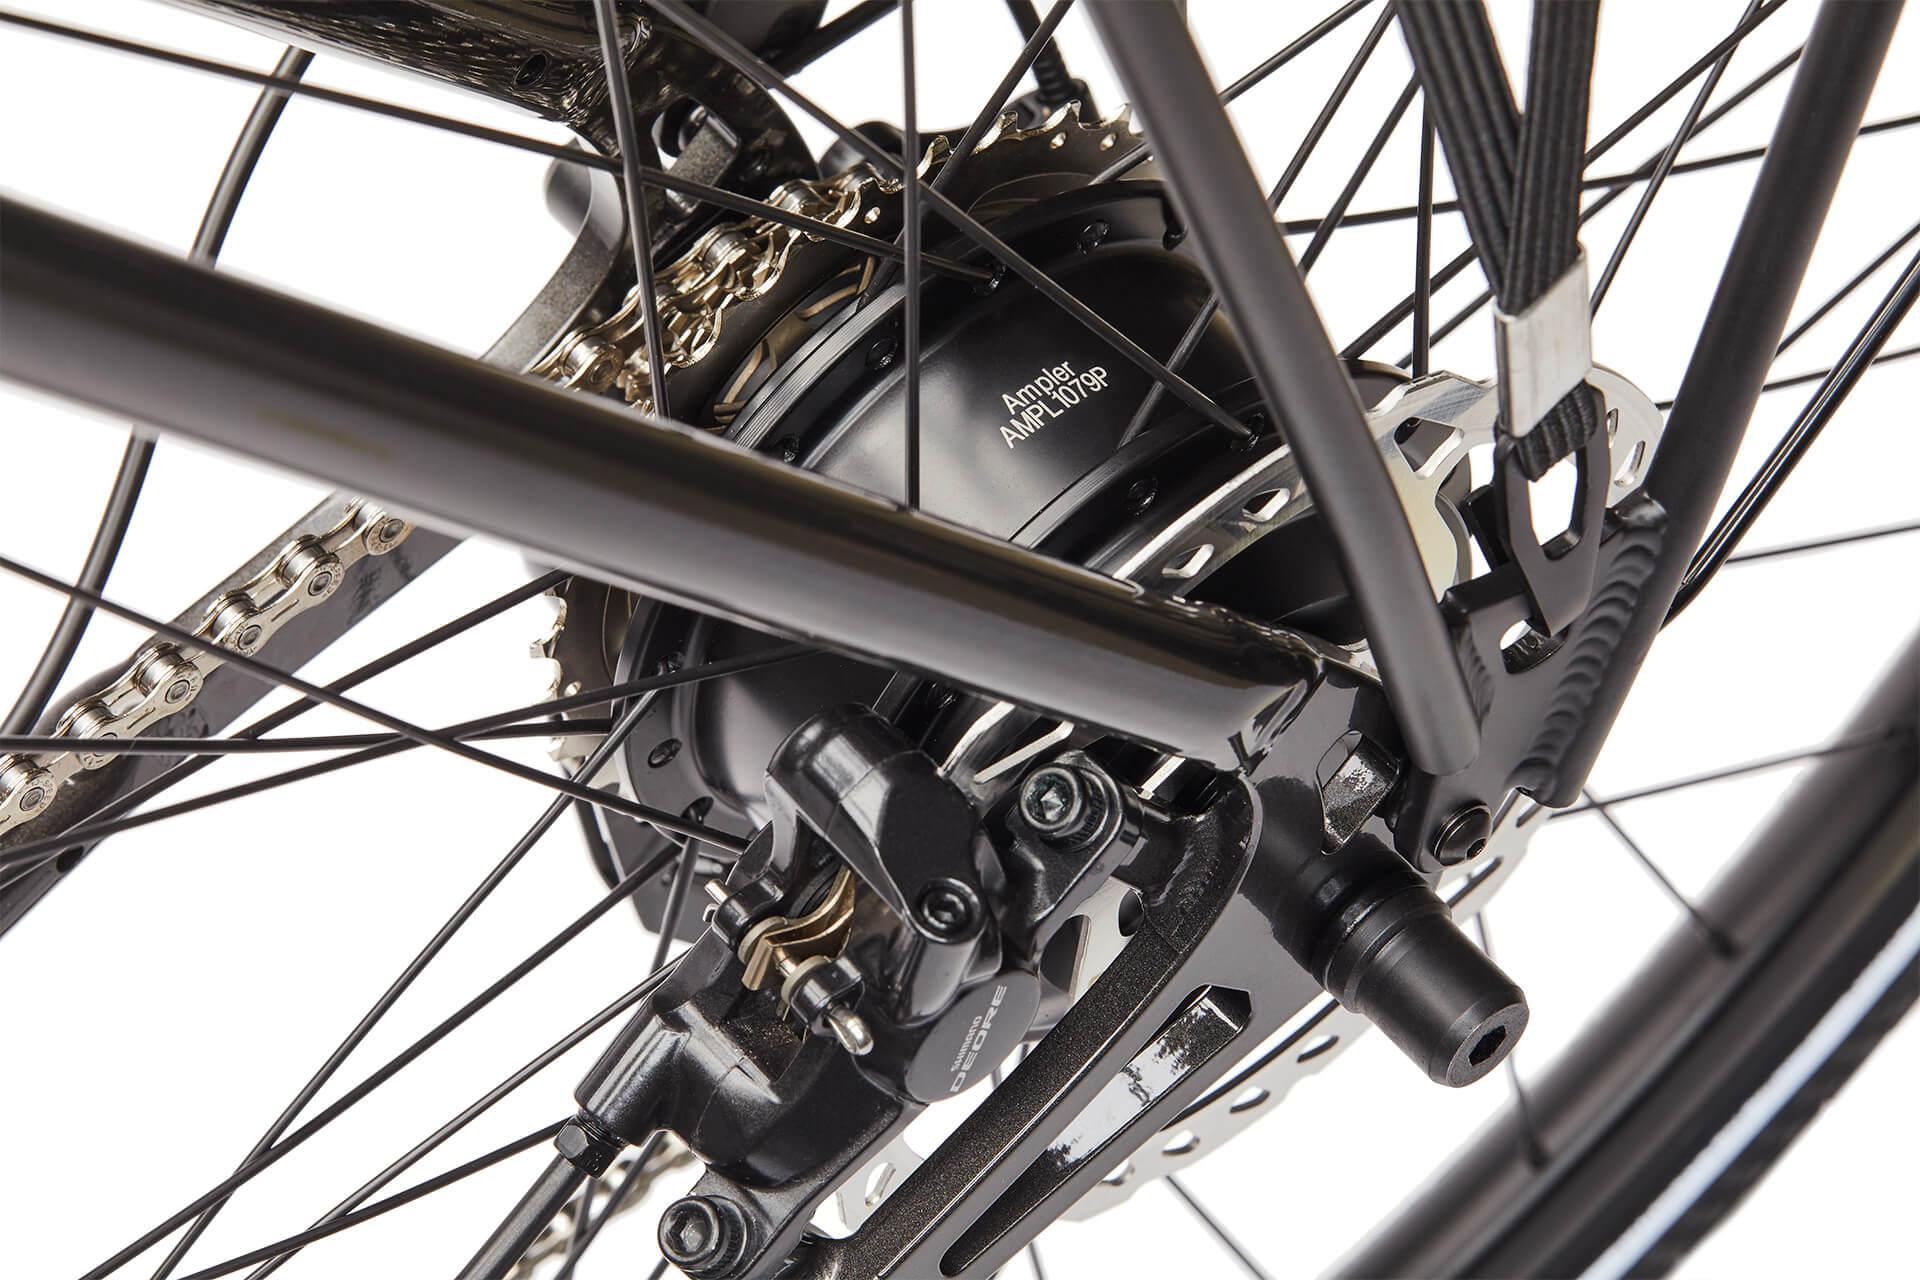 the ampler rear motor